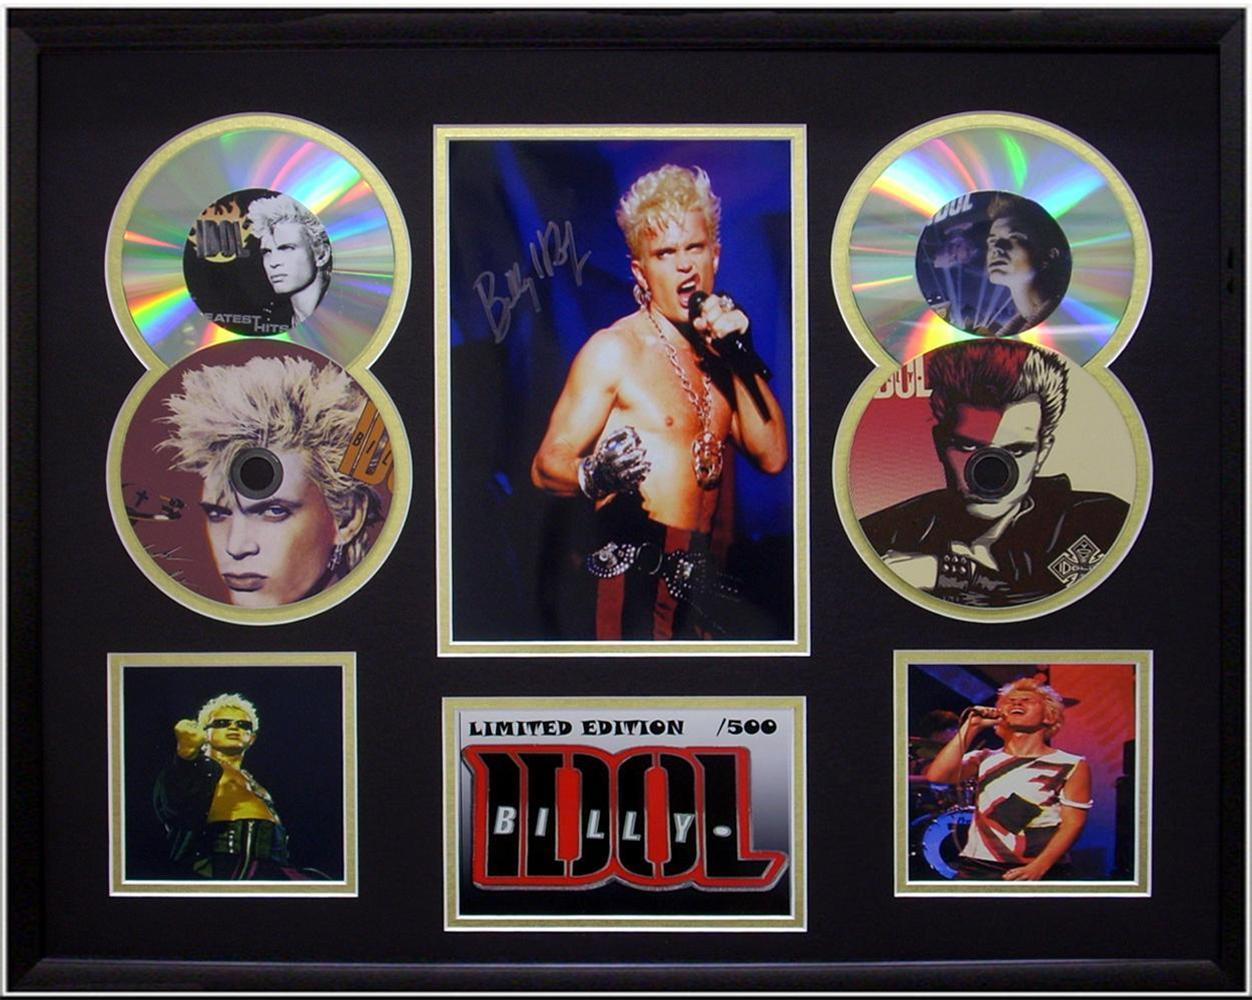 Billy-Idol-Generation-X-Lim-Ed-Music-4-CD-Photo-Display